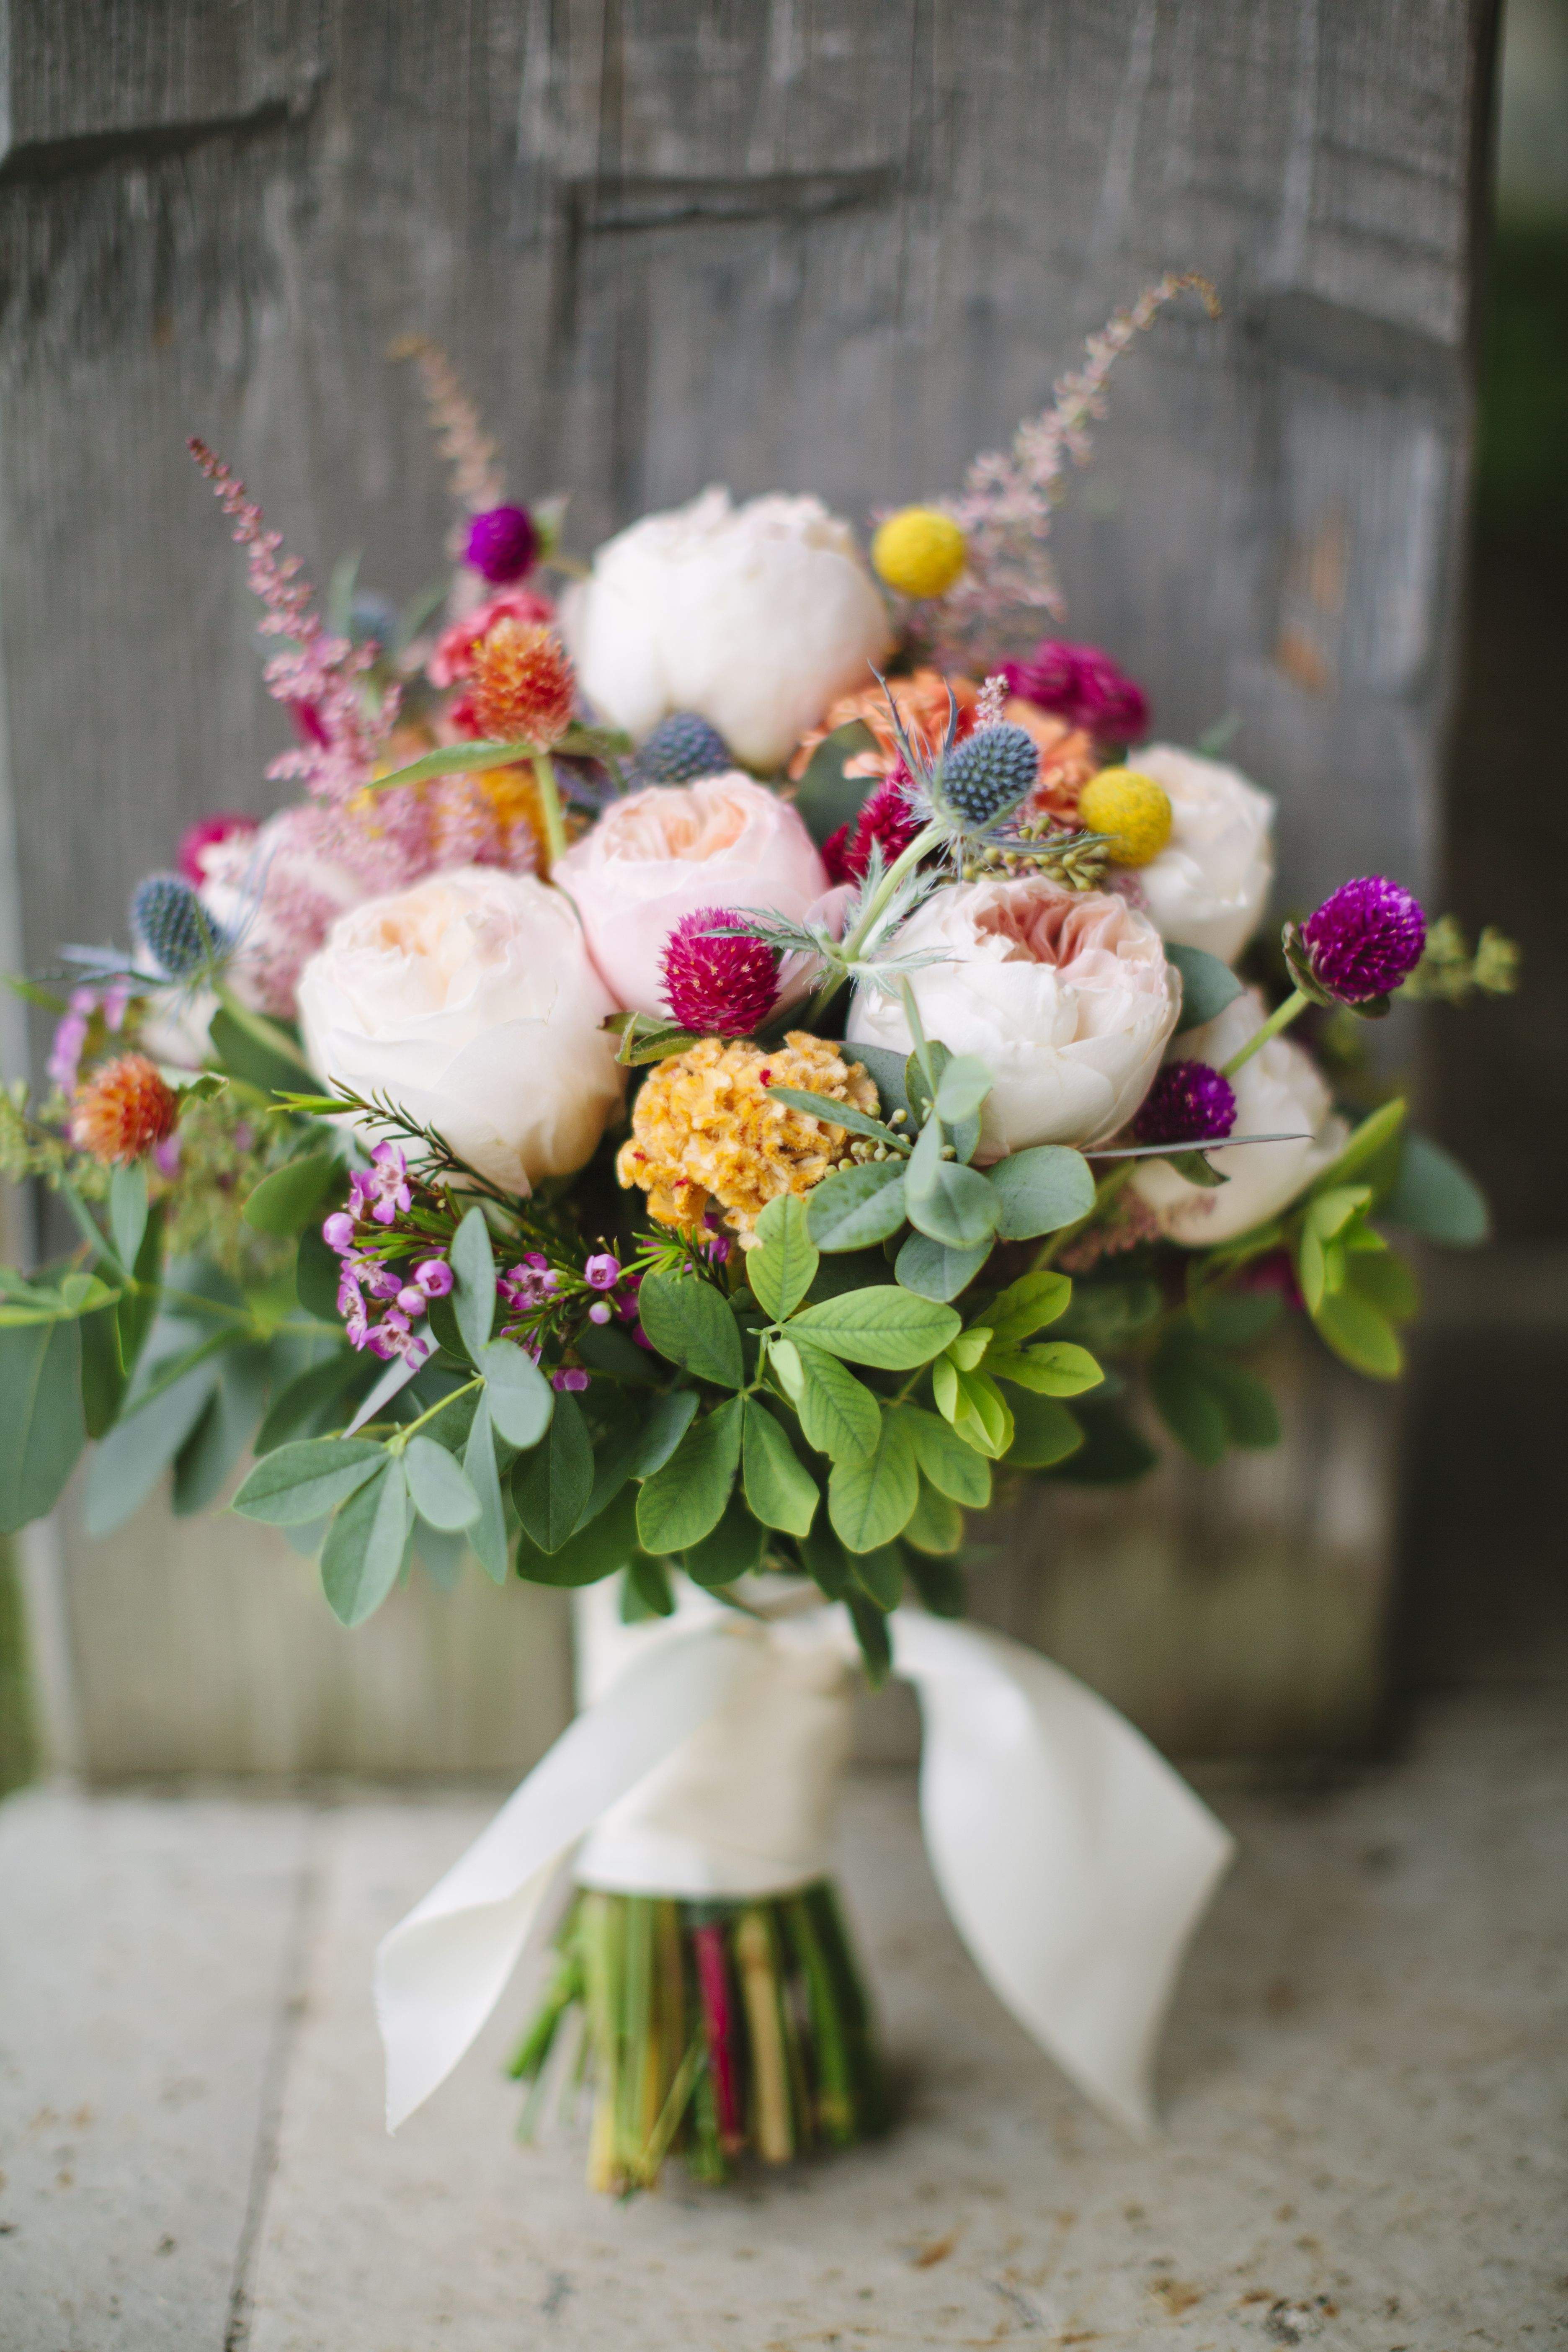 Colorful Wildflower Wedding Bouquet MadamPaloozaEmporium Facebook MadamPalooza